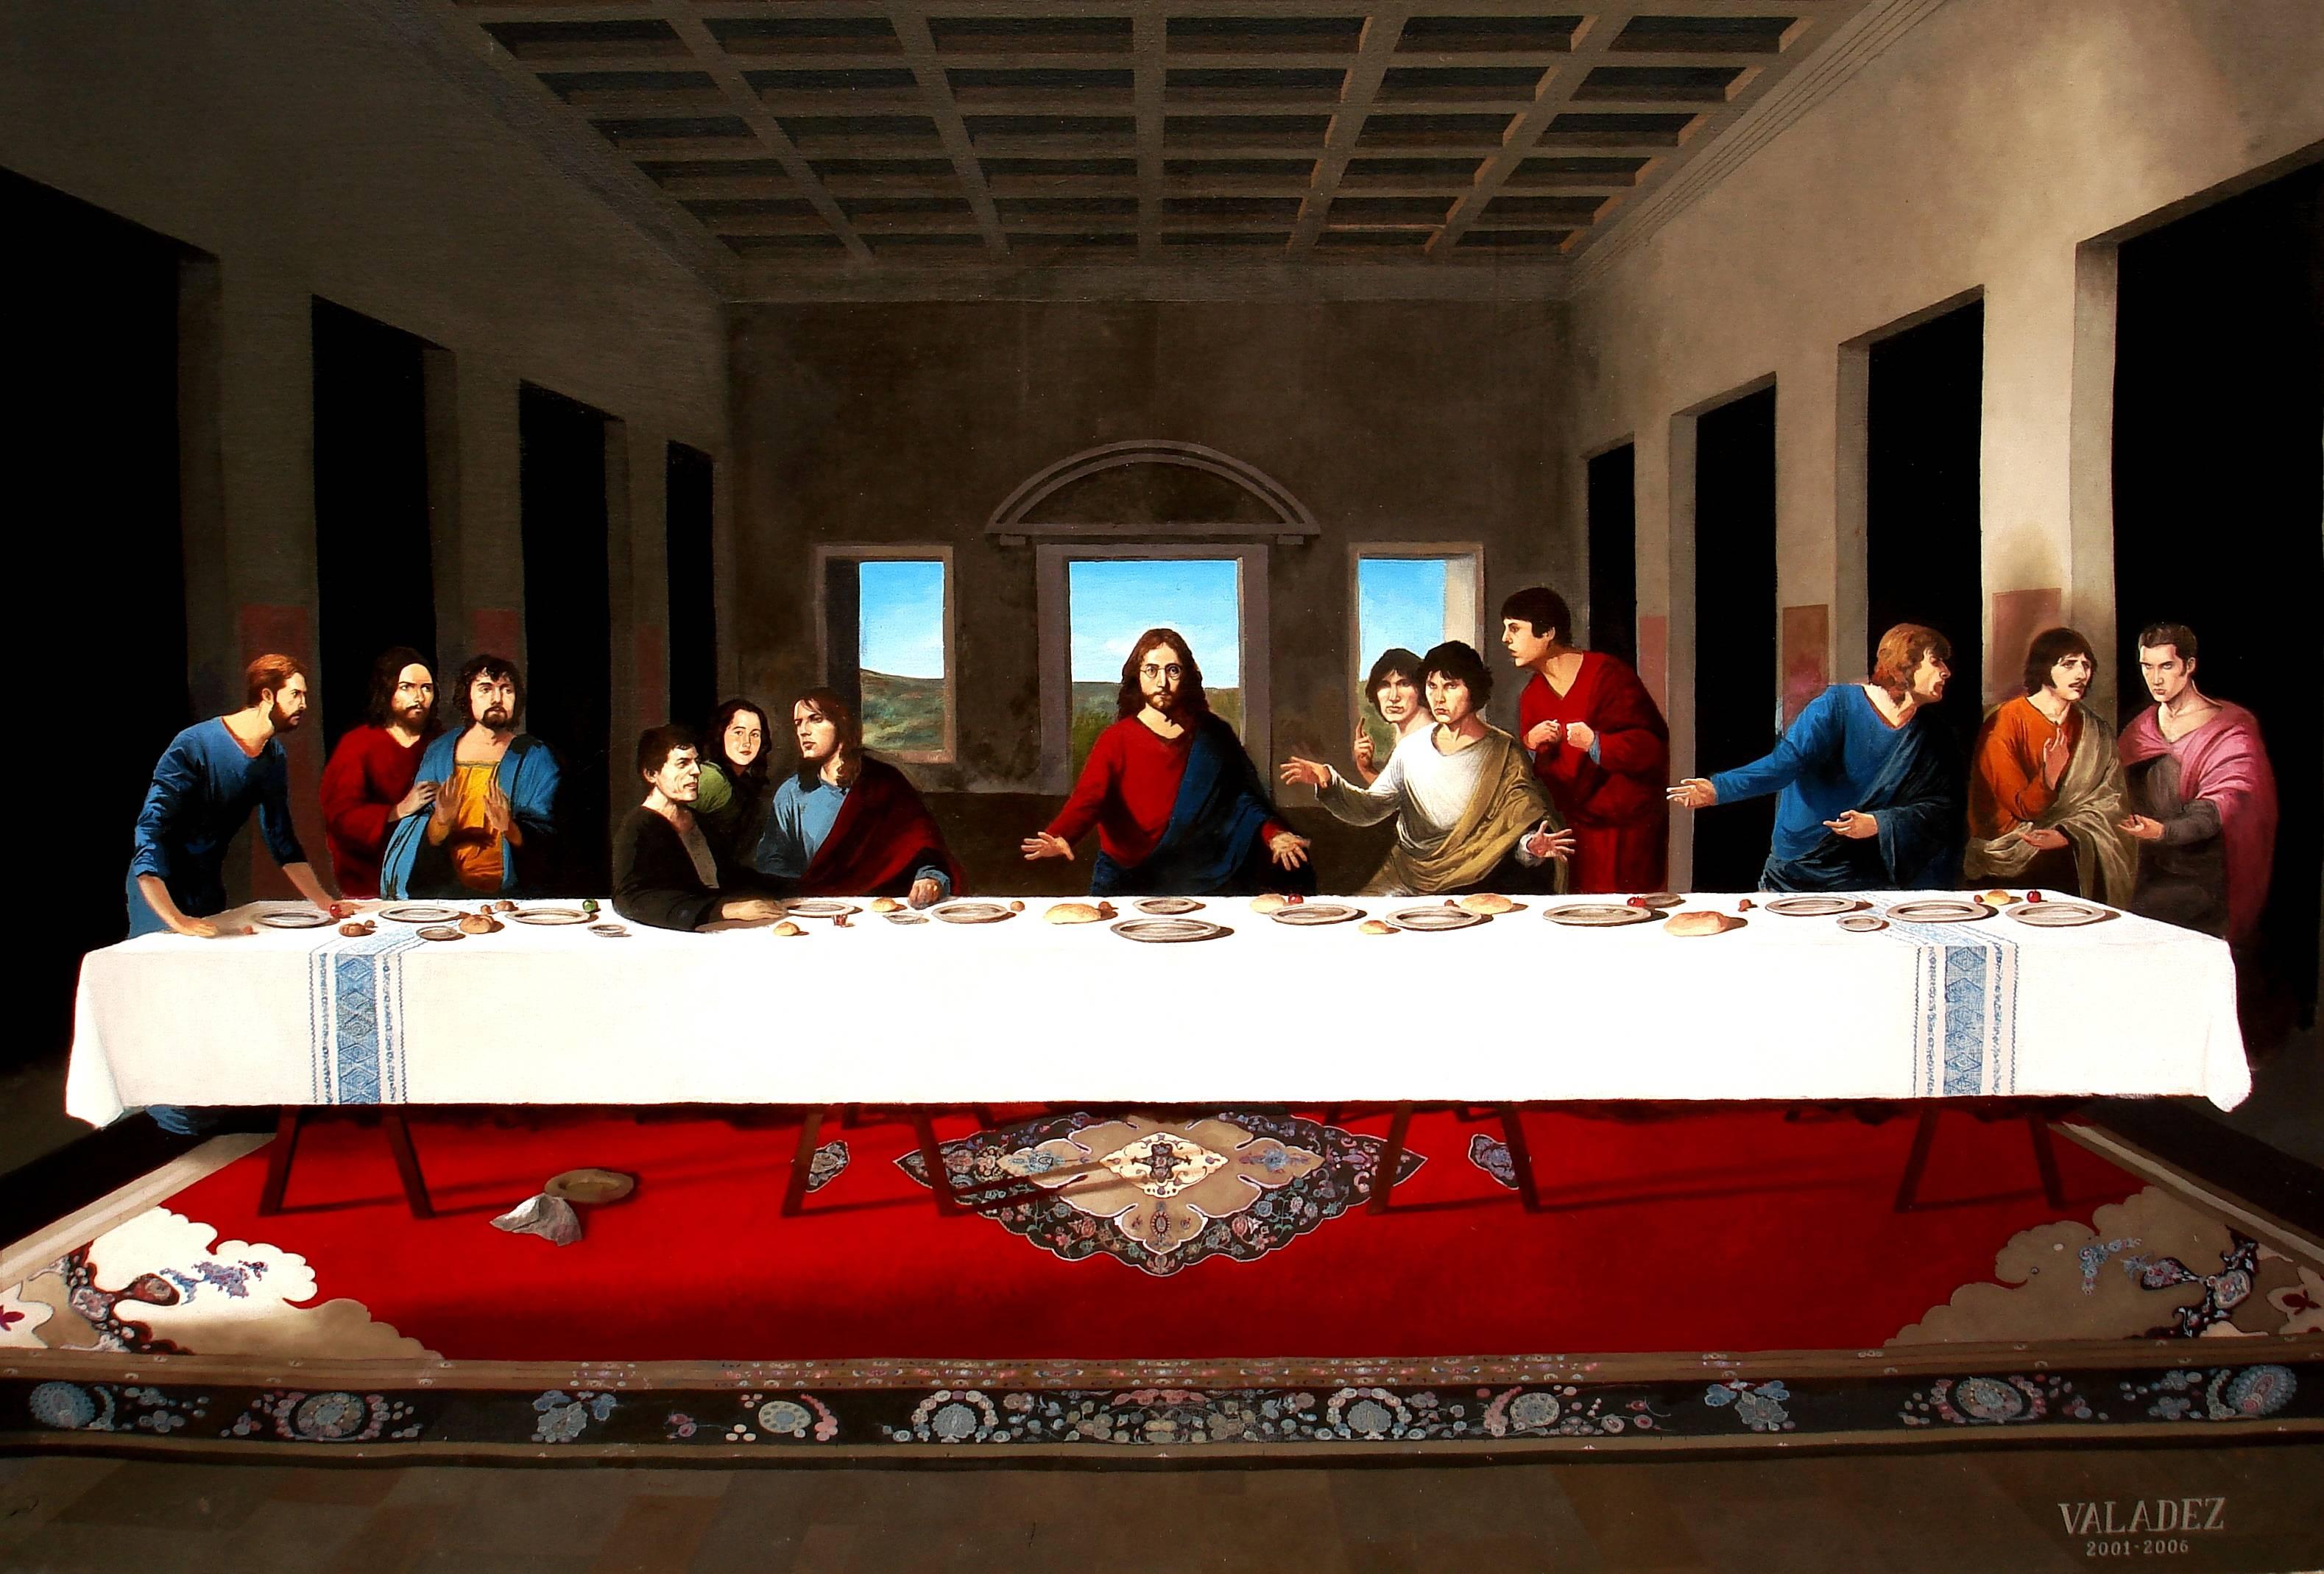 93 Jesus Dinner Table Wallpapers On Wallpapersafari